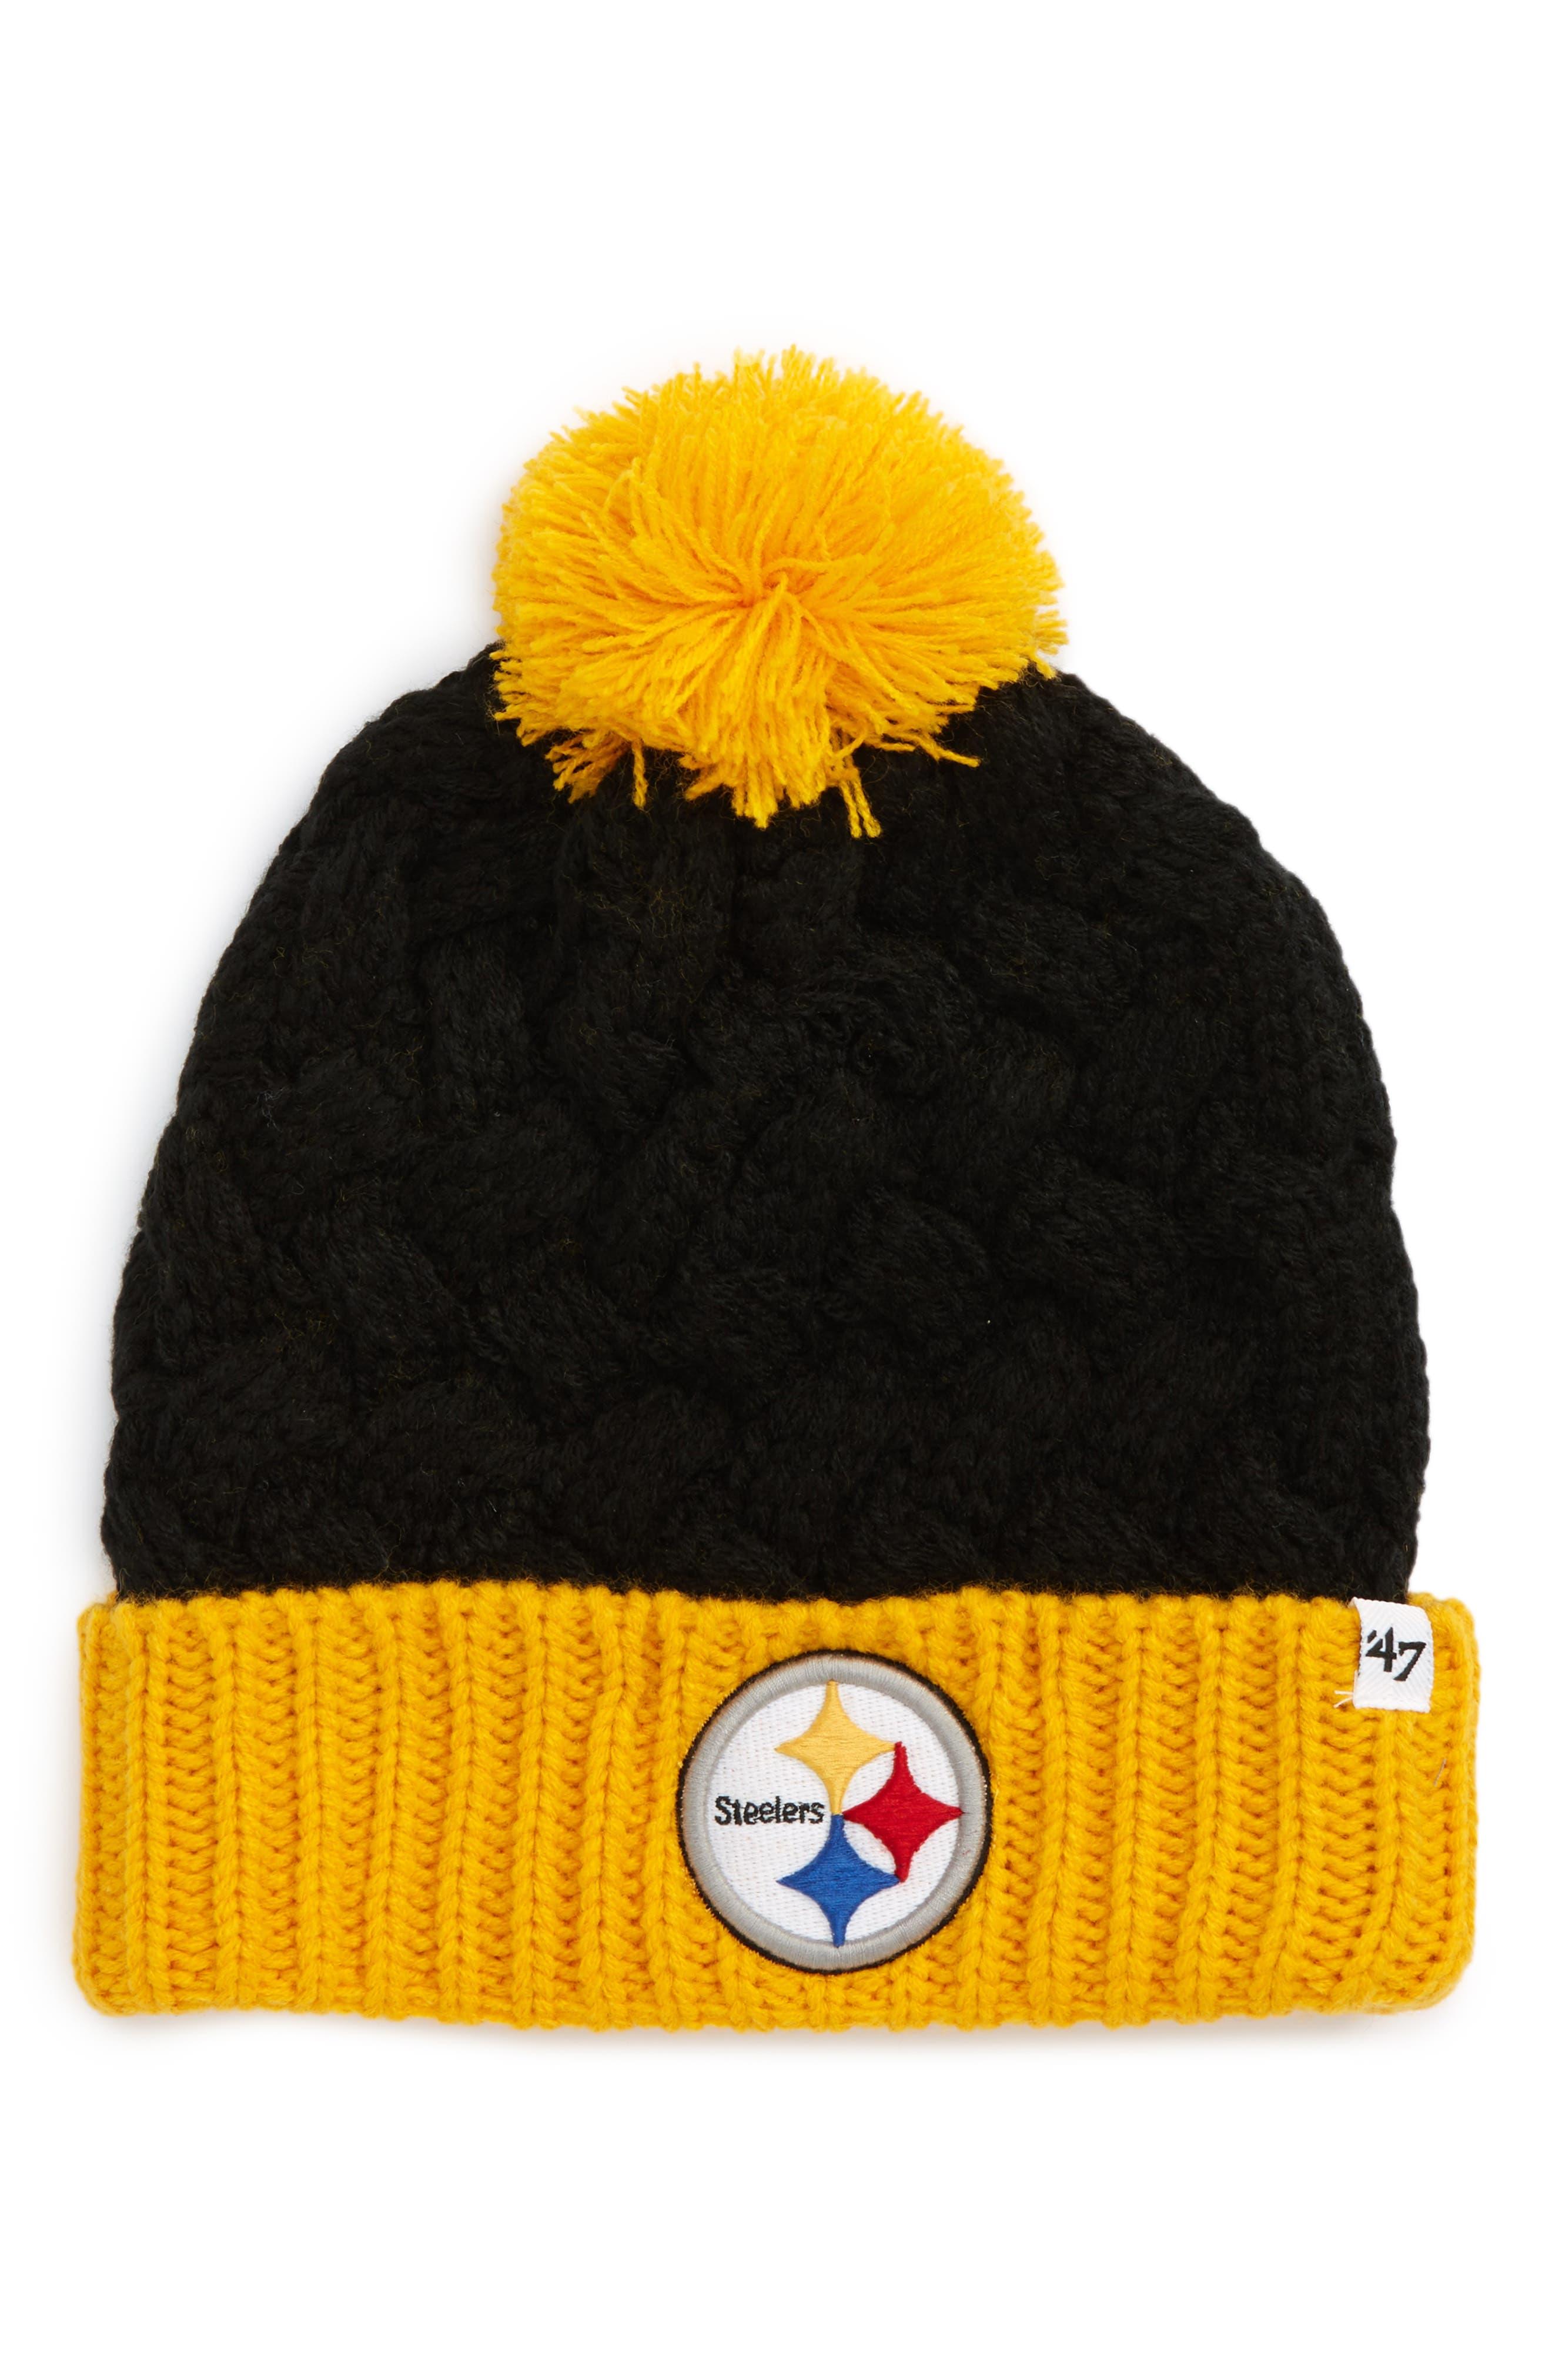 Main Image - '47 Matterhorn Pittsburgh Steelers Beanie